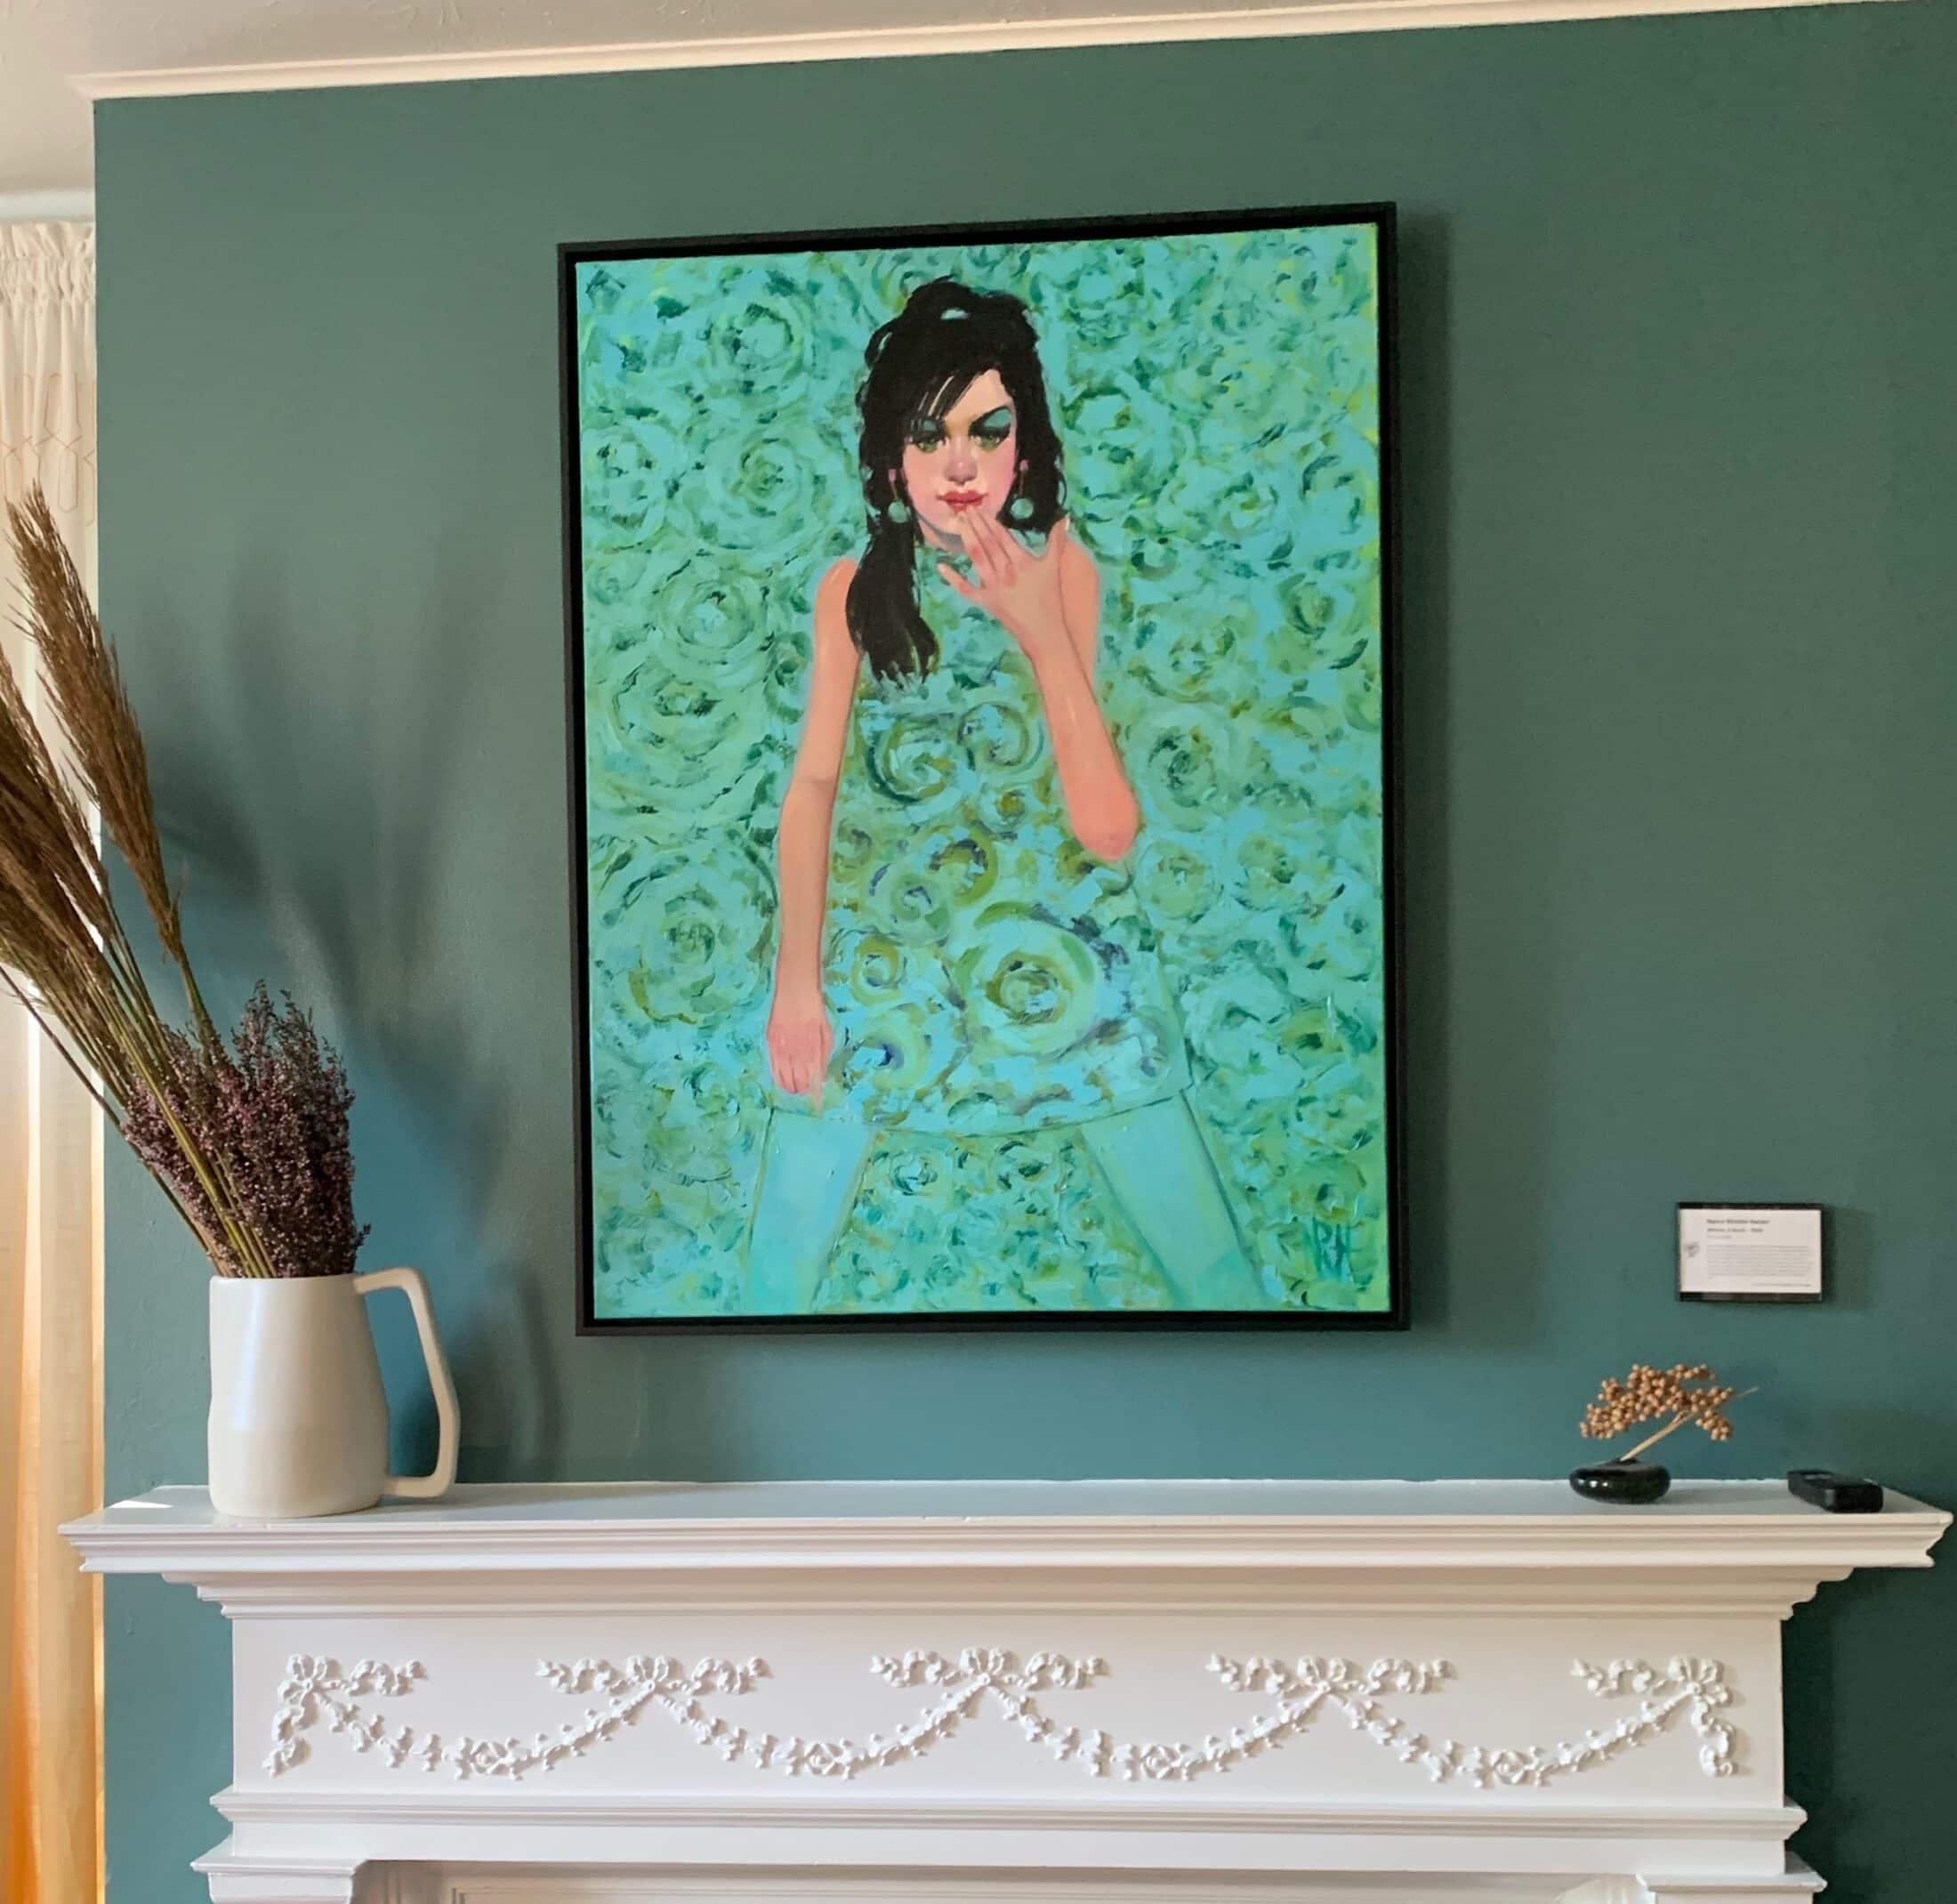 ART SPOTLIGHT: WHISKEY A GO GO, The Applewood Manor